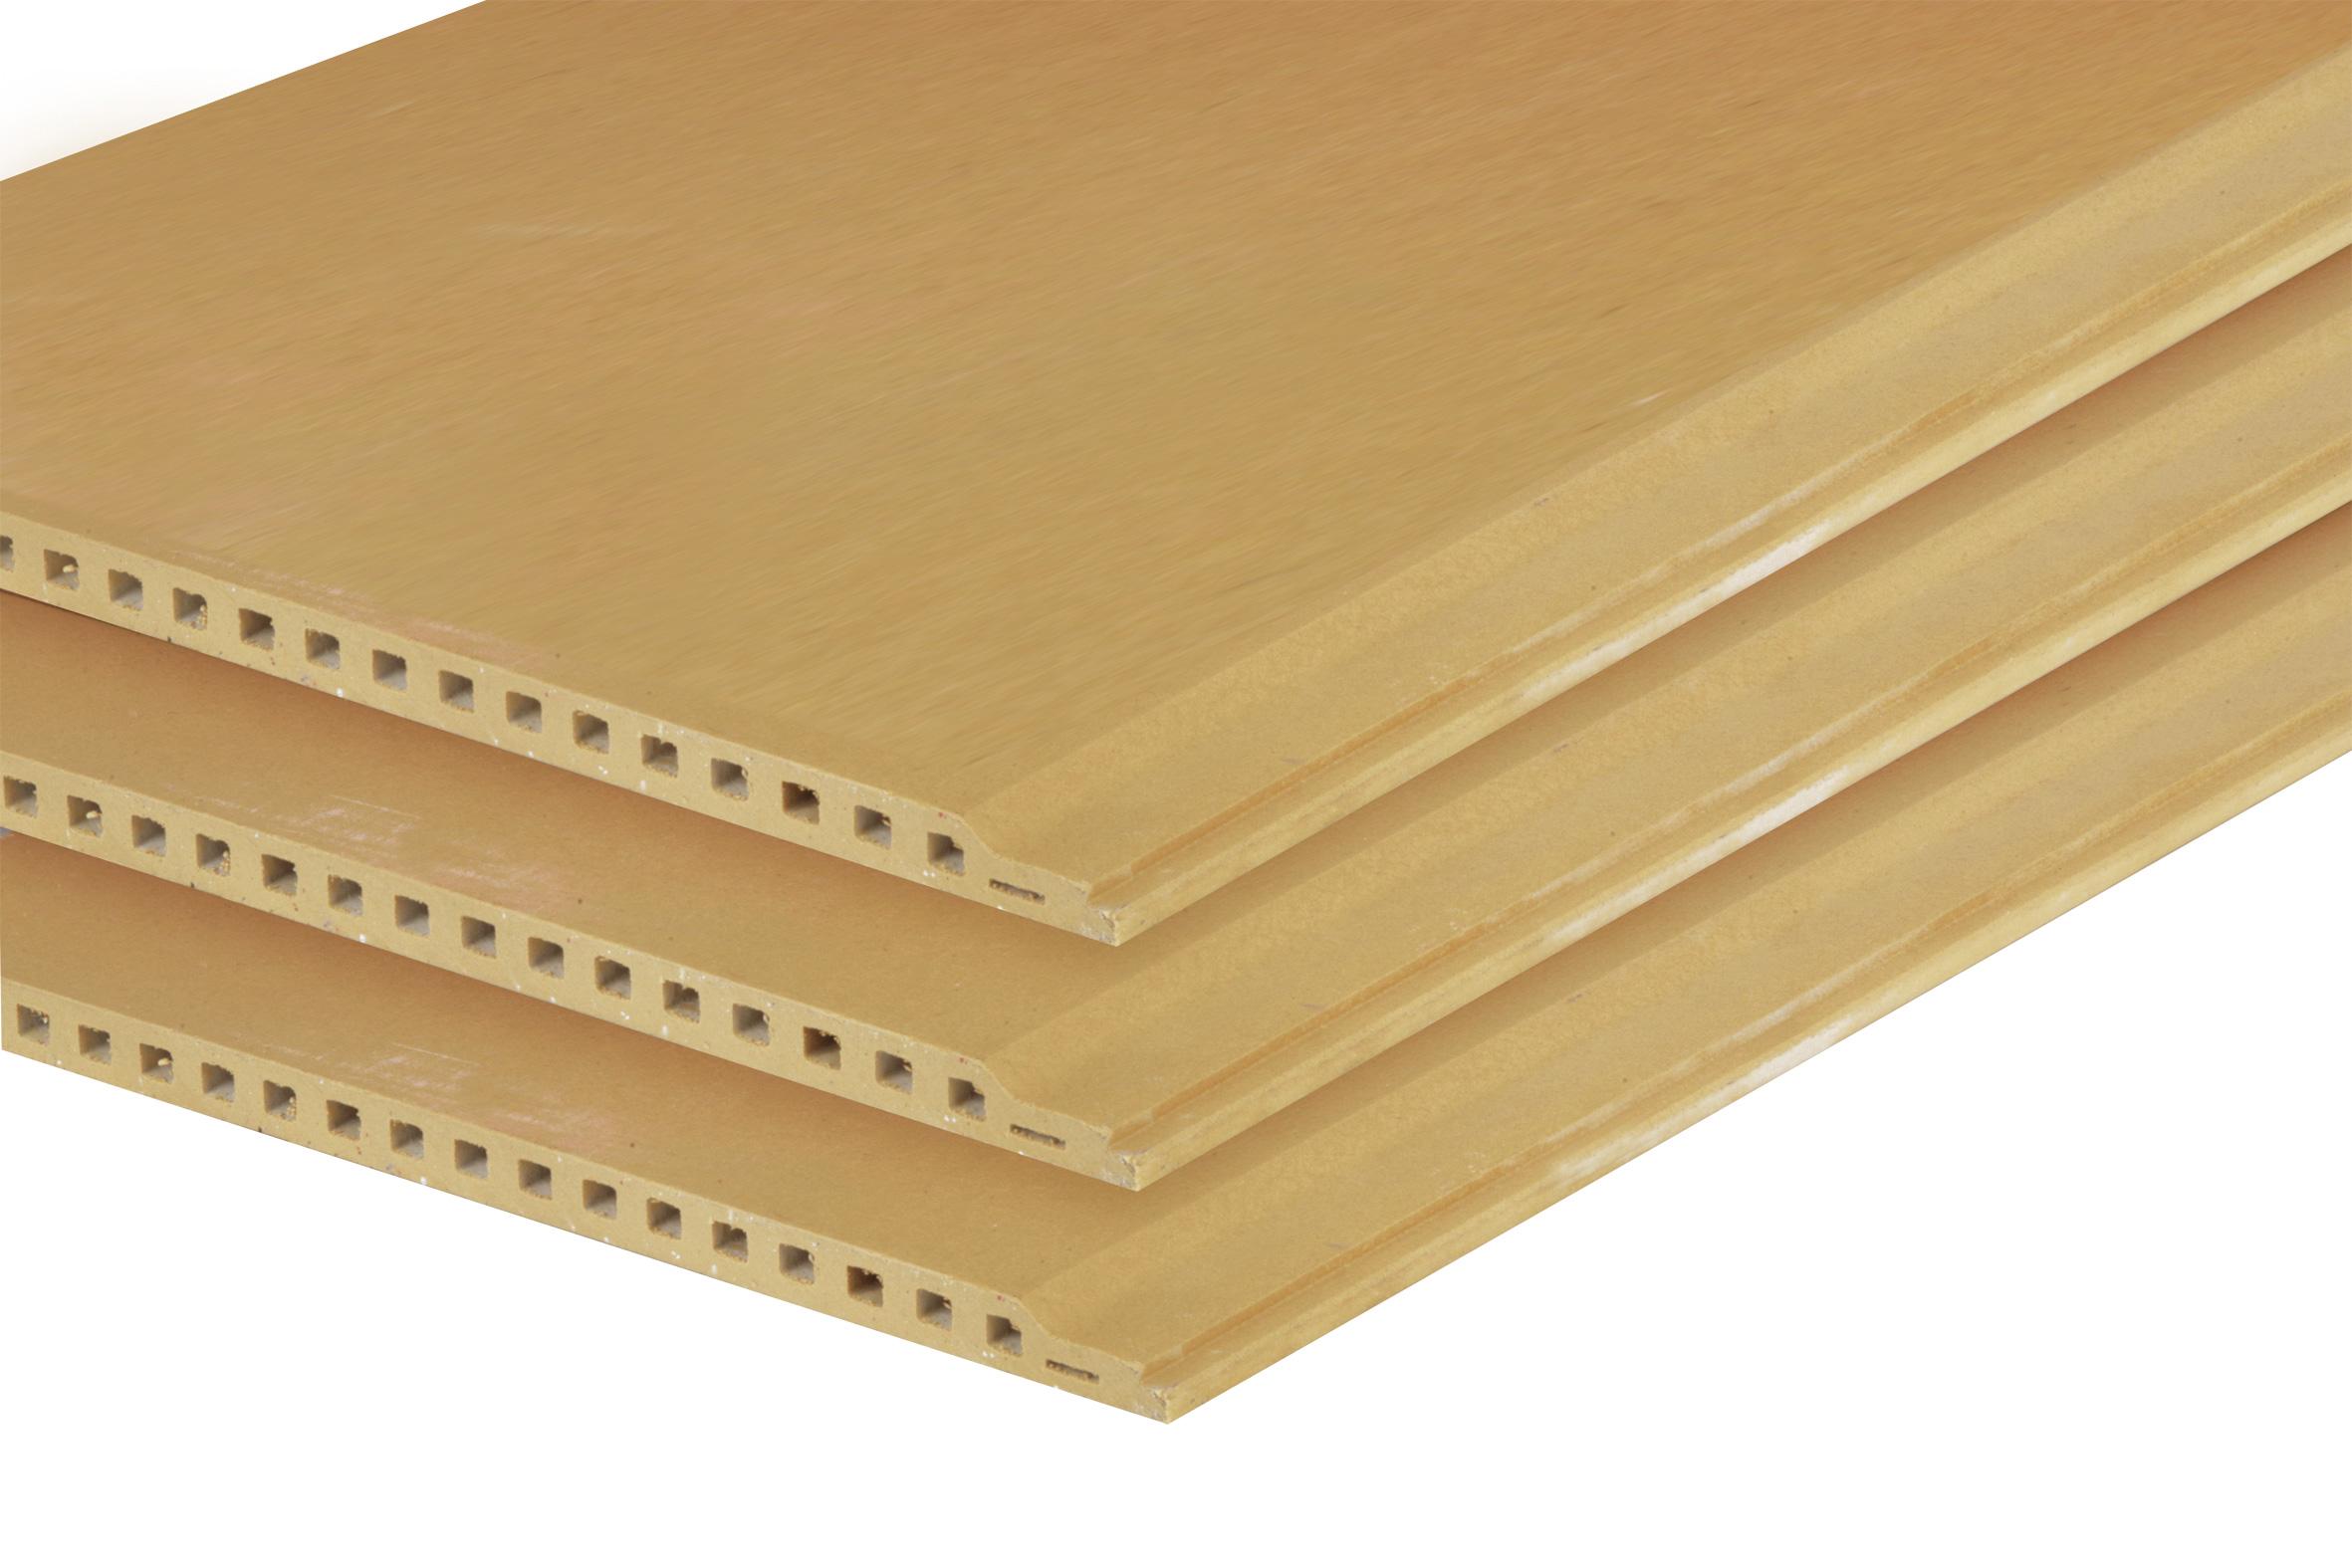 BNBM HOLLOW intensified fiber cement board/ siding--a new type of external decoration material